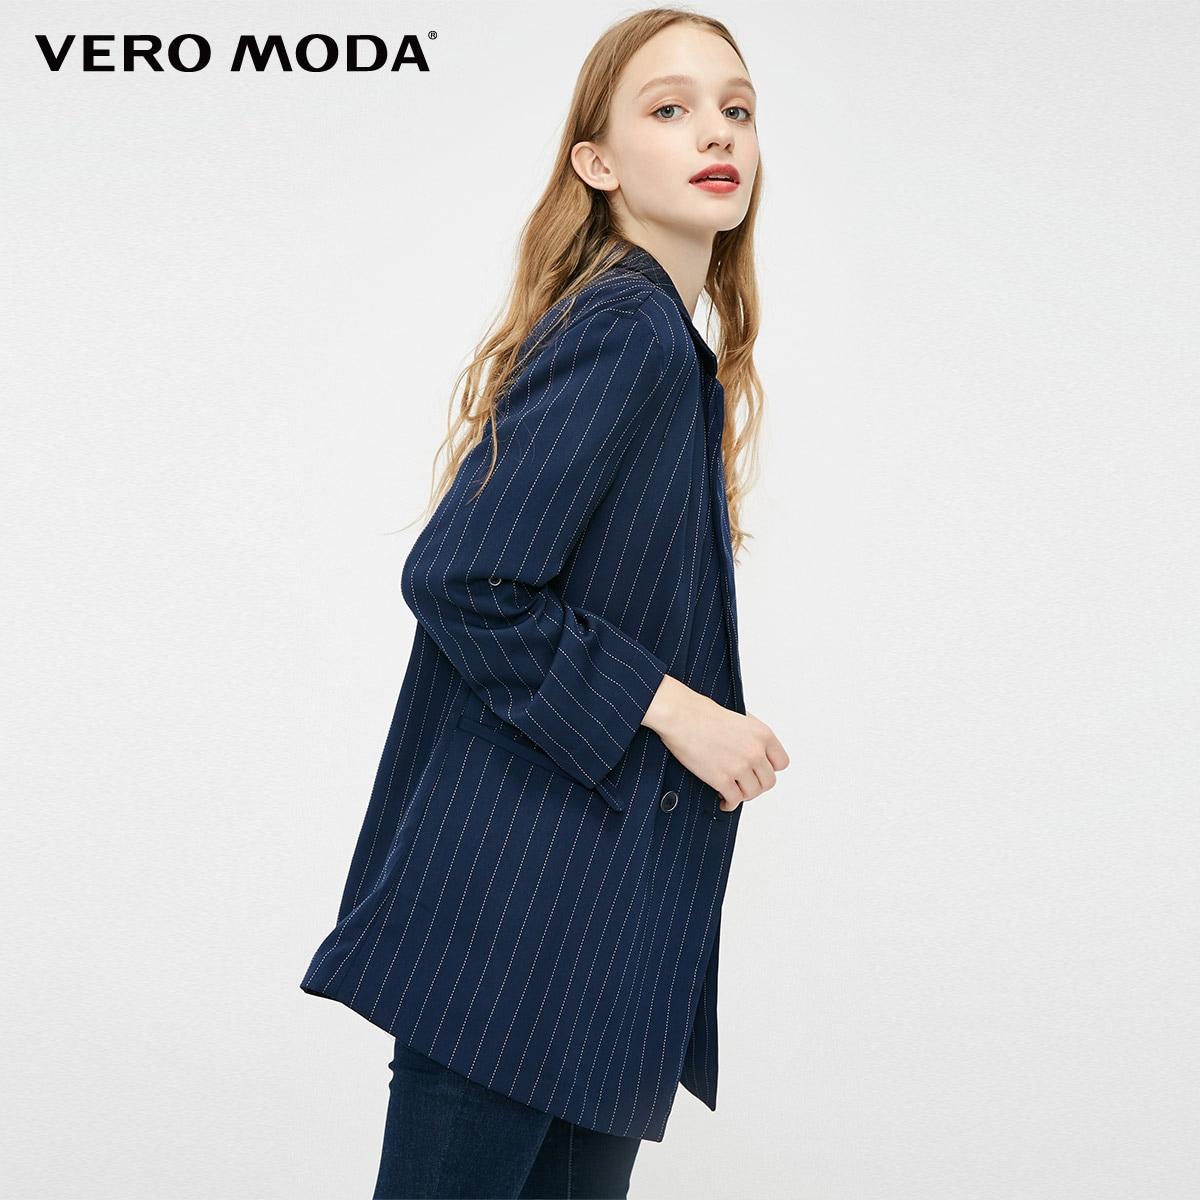 Vero Moda New Women's Double-breasted Thin Blazer | 319108503